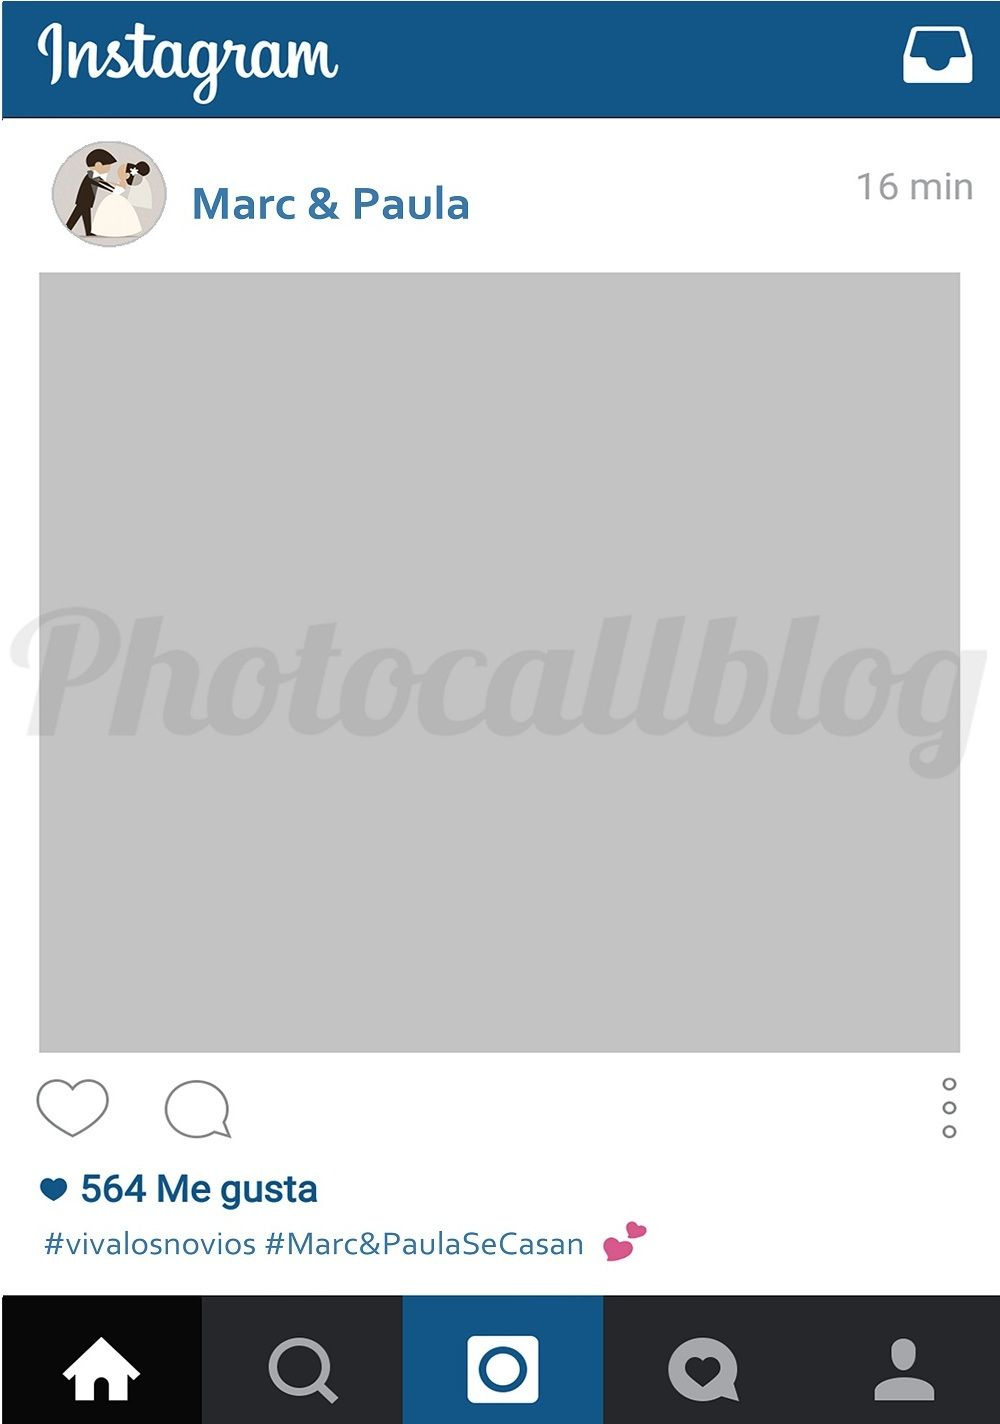 PHOTOCALL MARCO INSTAGRAM PERSONALIZADO | Pinterest | Instagram ...